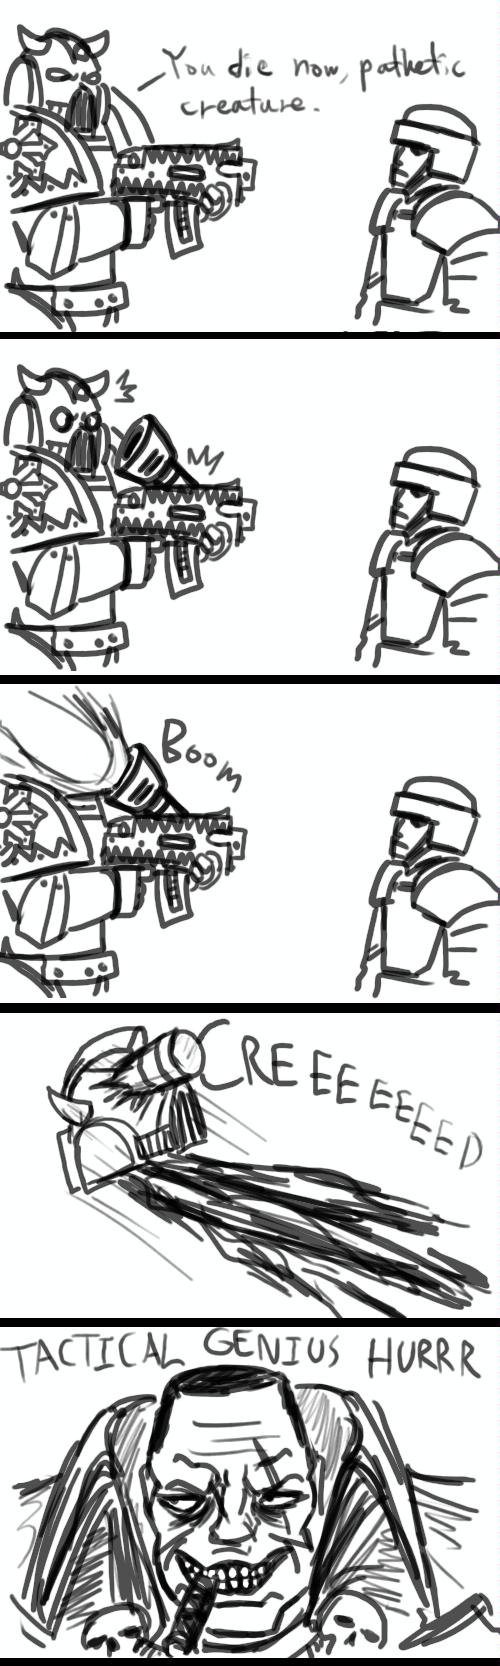 Creed, Humor, Imperial Guard, Tactical Genius